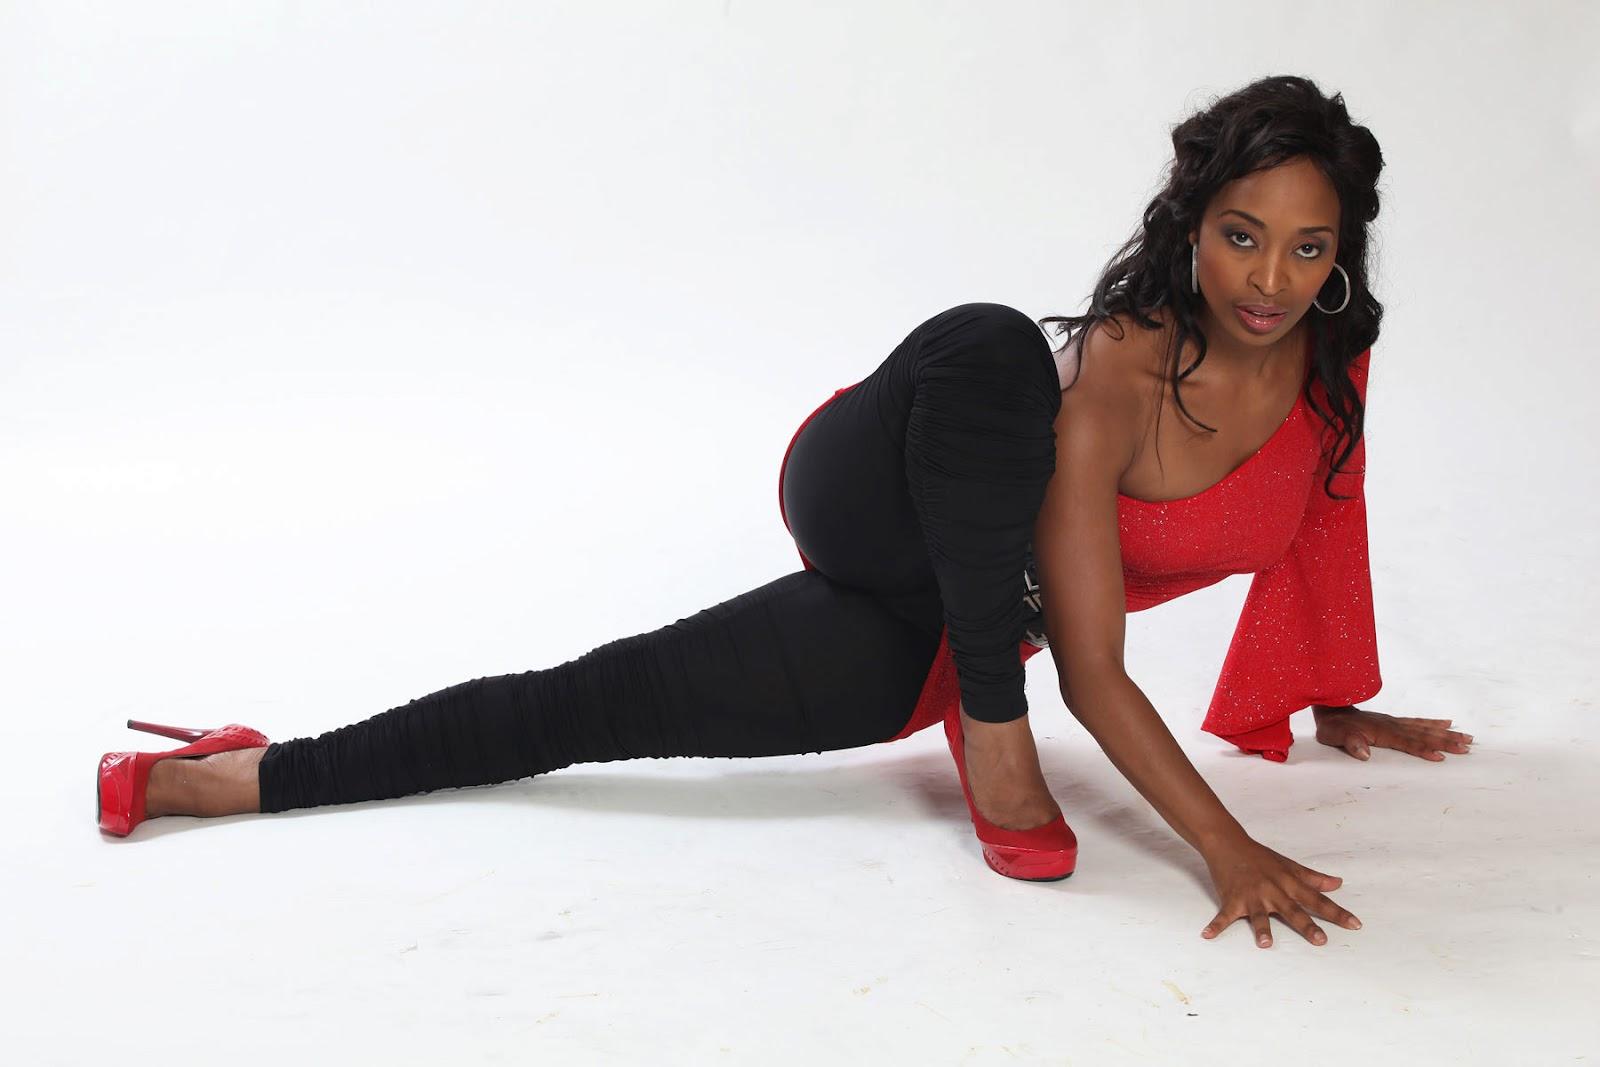 Khabonina Qubeka - South African actress